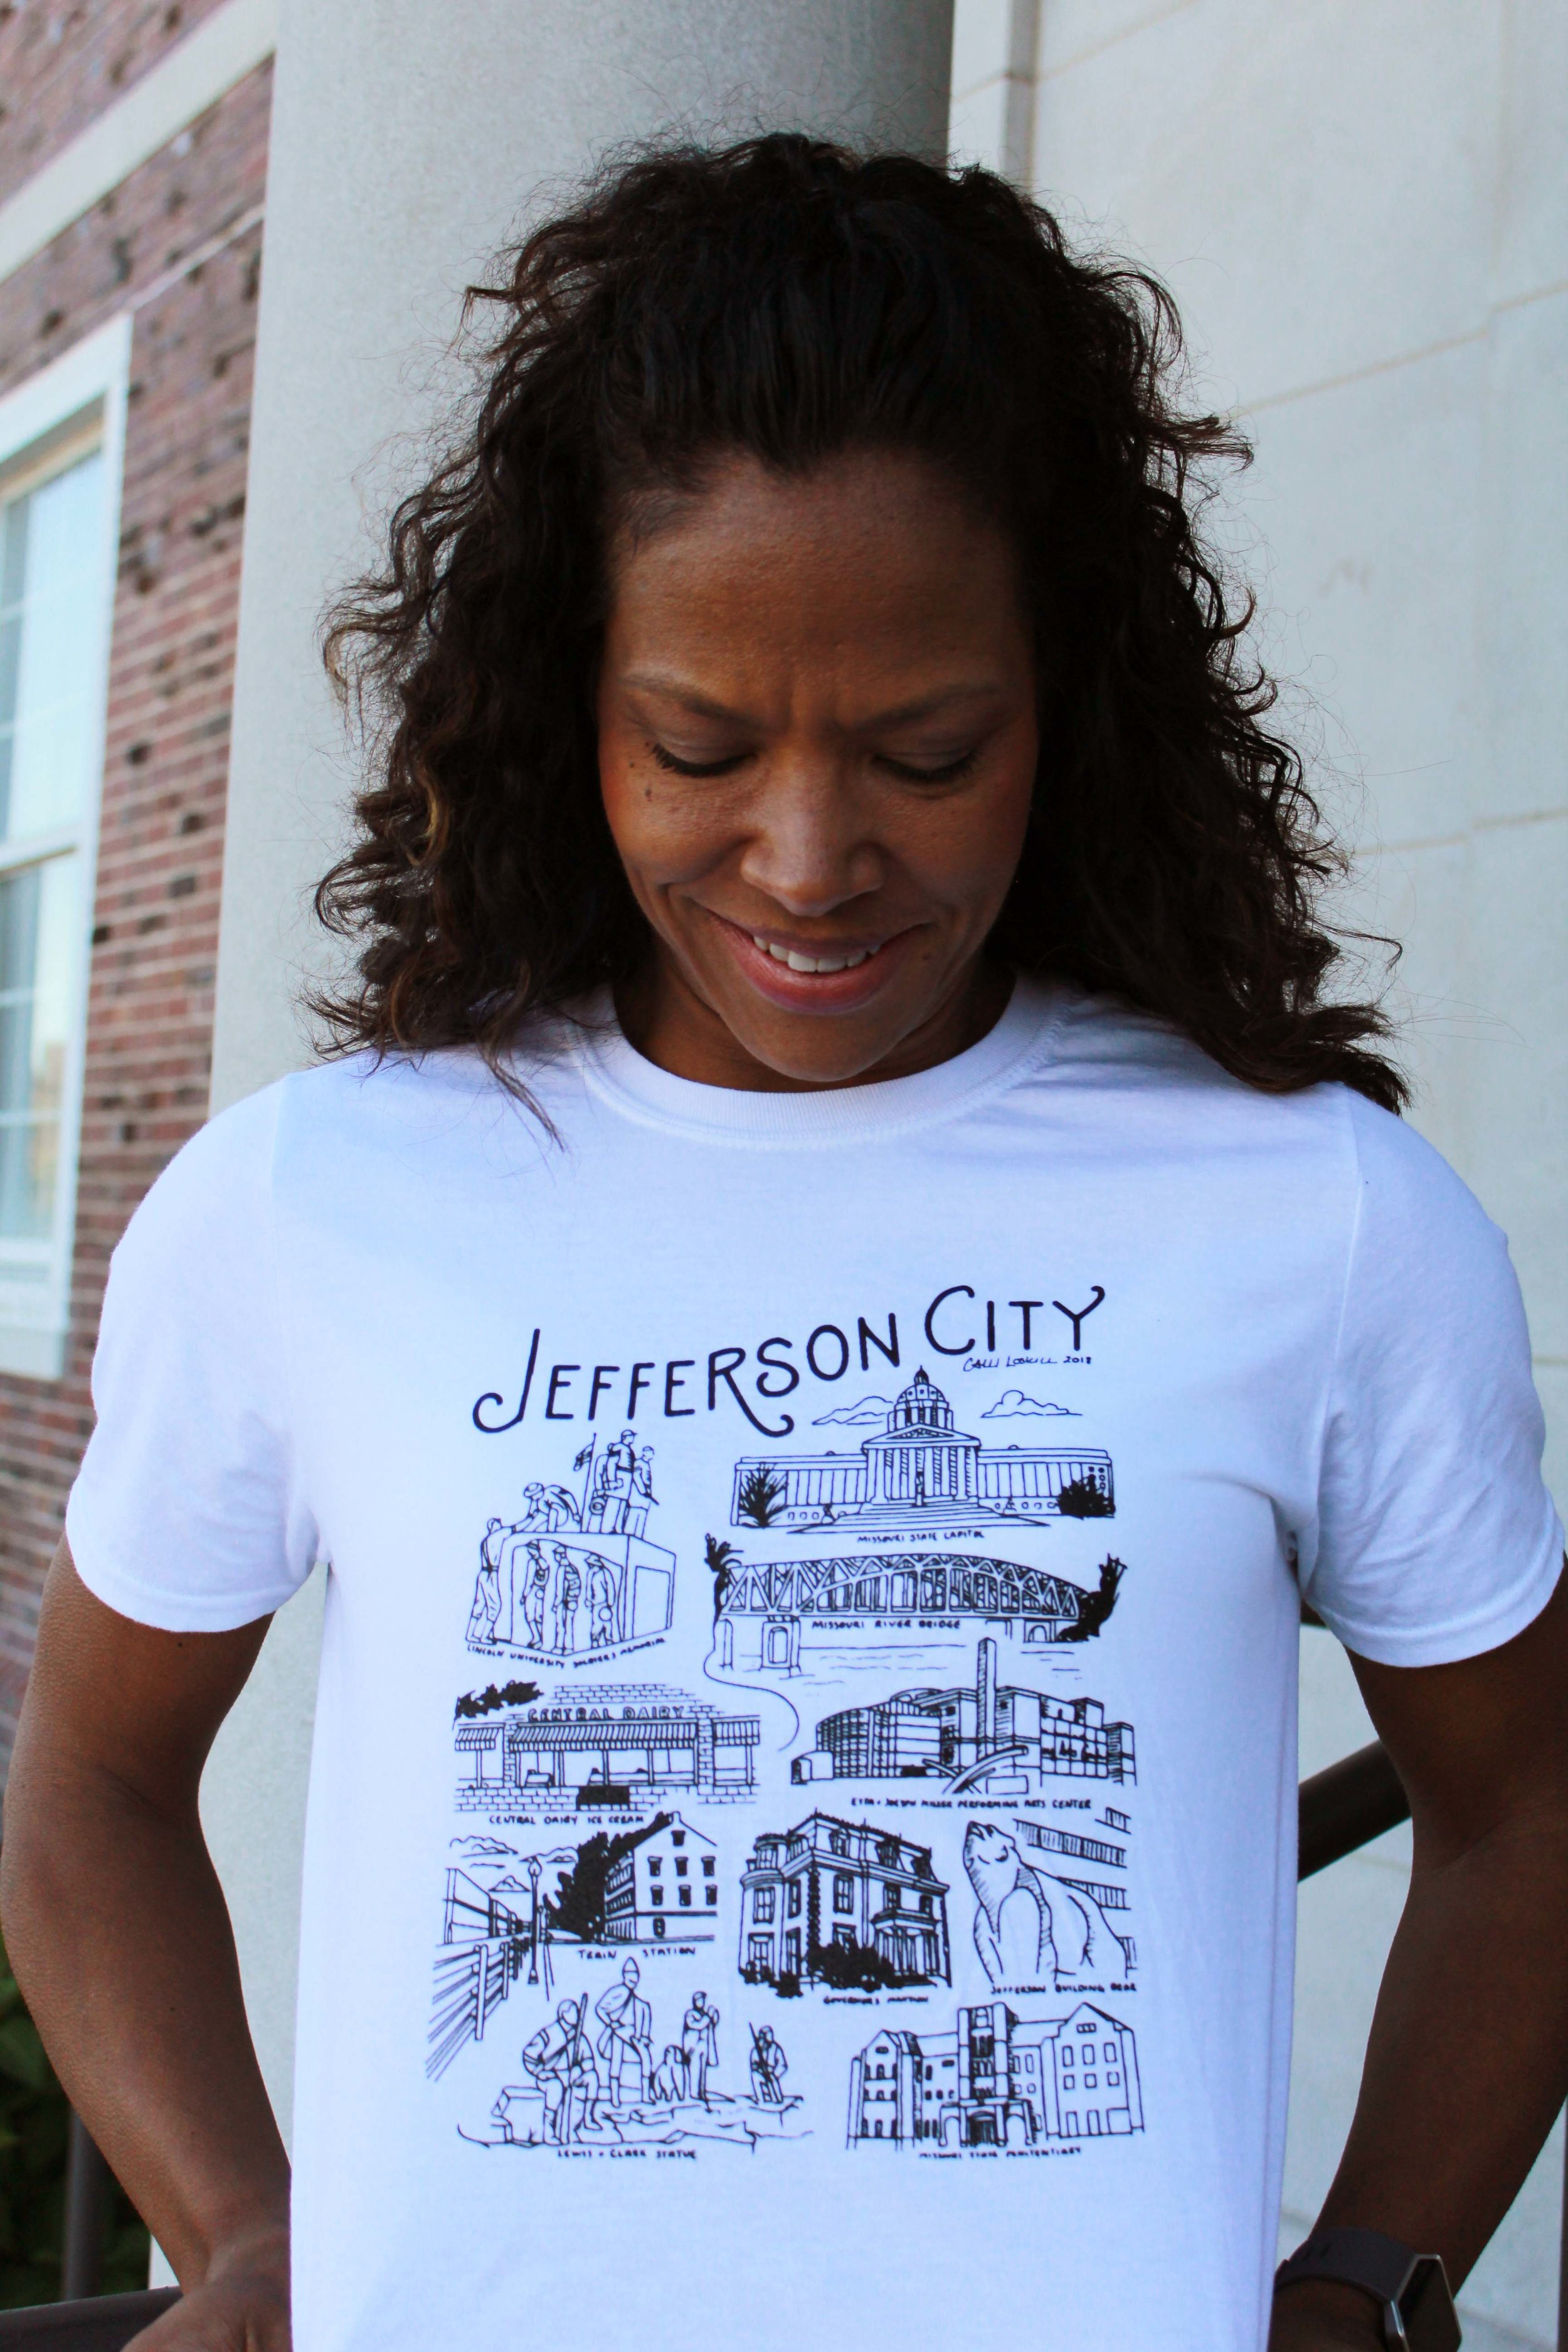 Crystal-Moseley-Lincoln-University-Jefferson-City-Missouri-jeff-city-blog-mo-swag